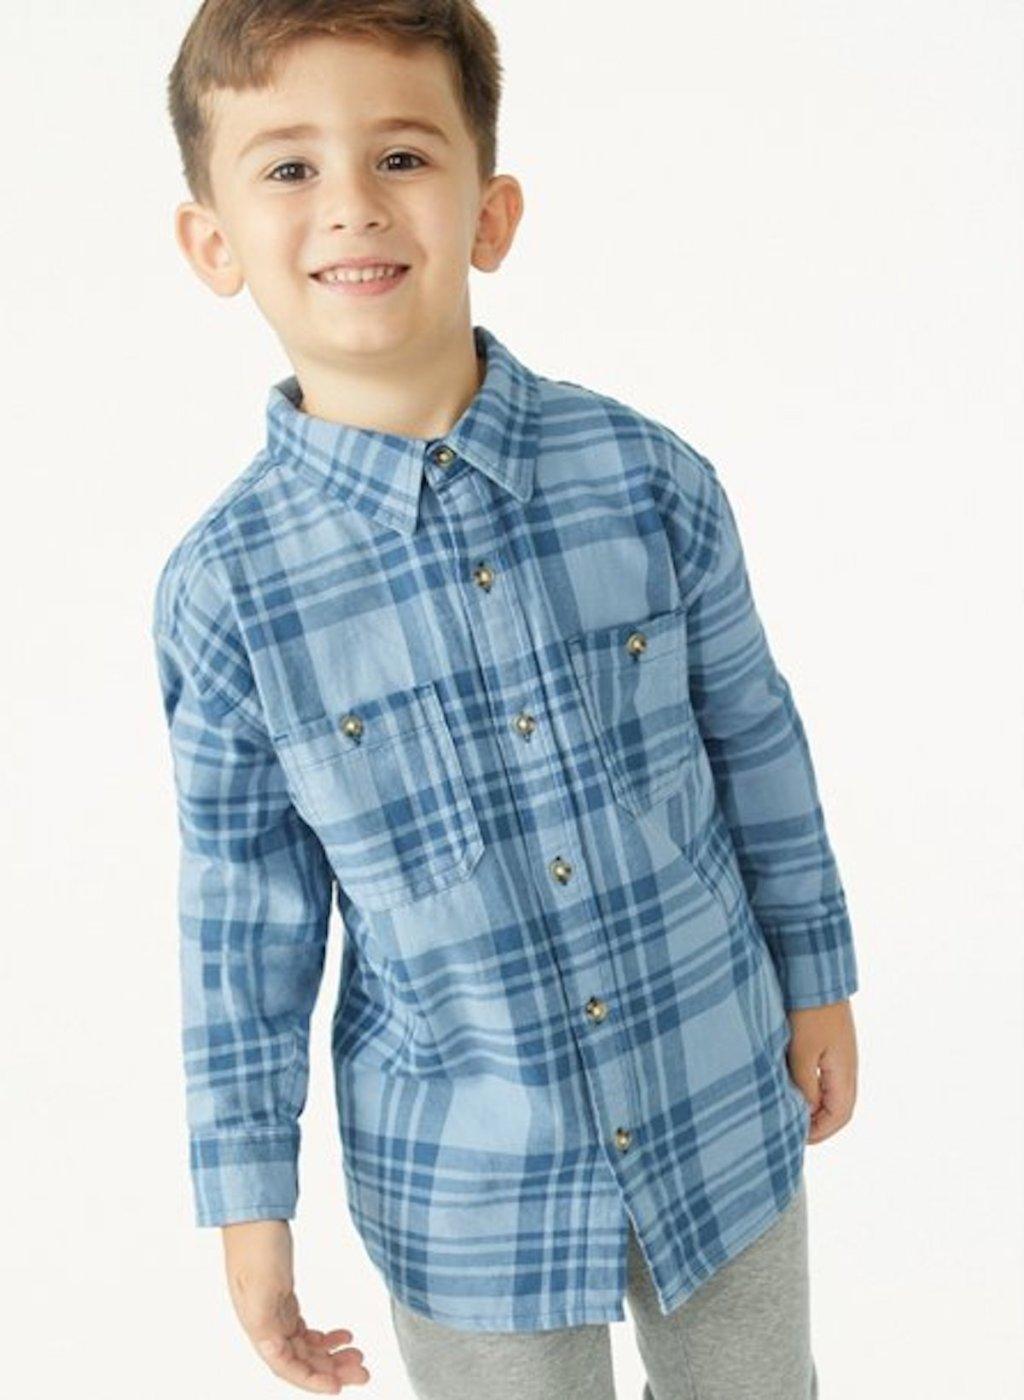 stock photo of boy wearing blue plaid shirt